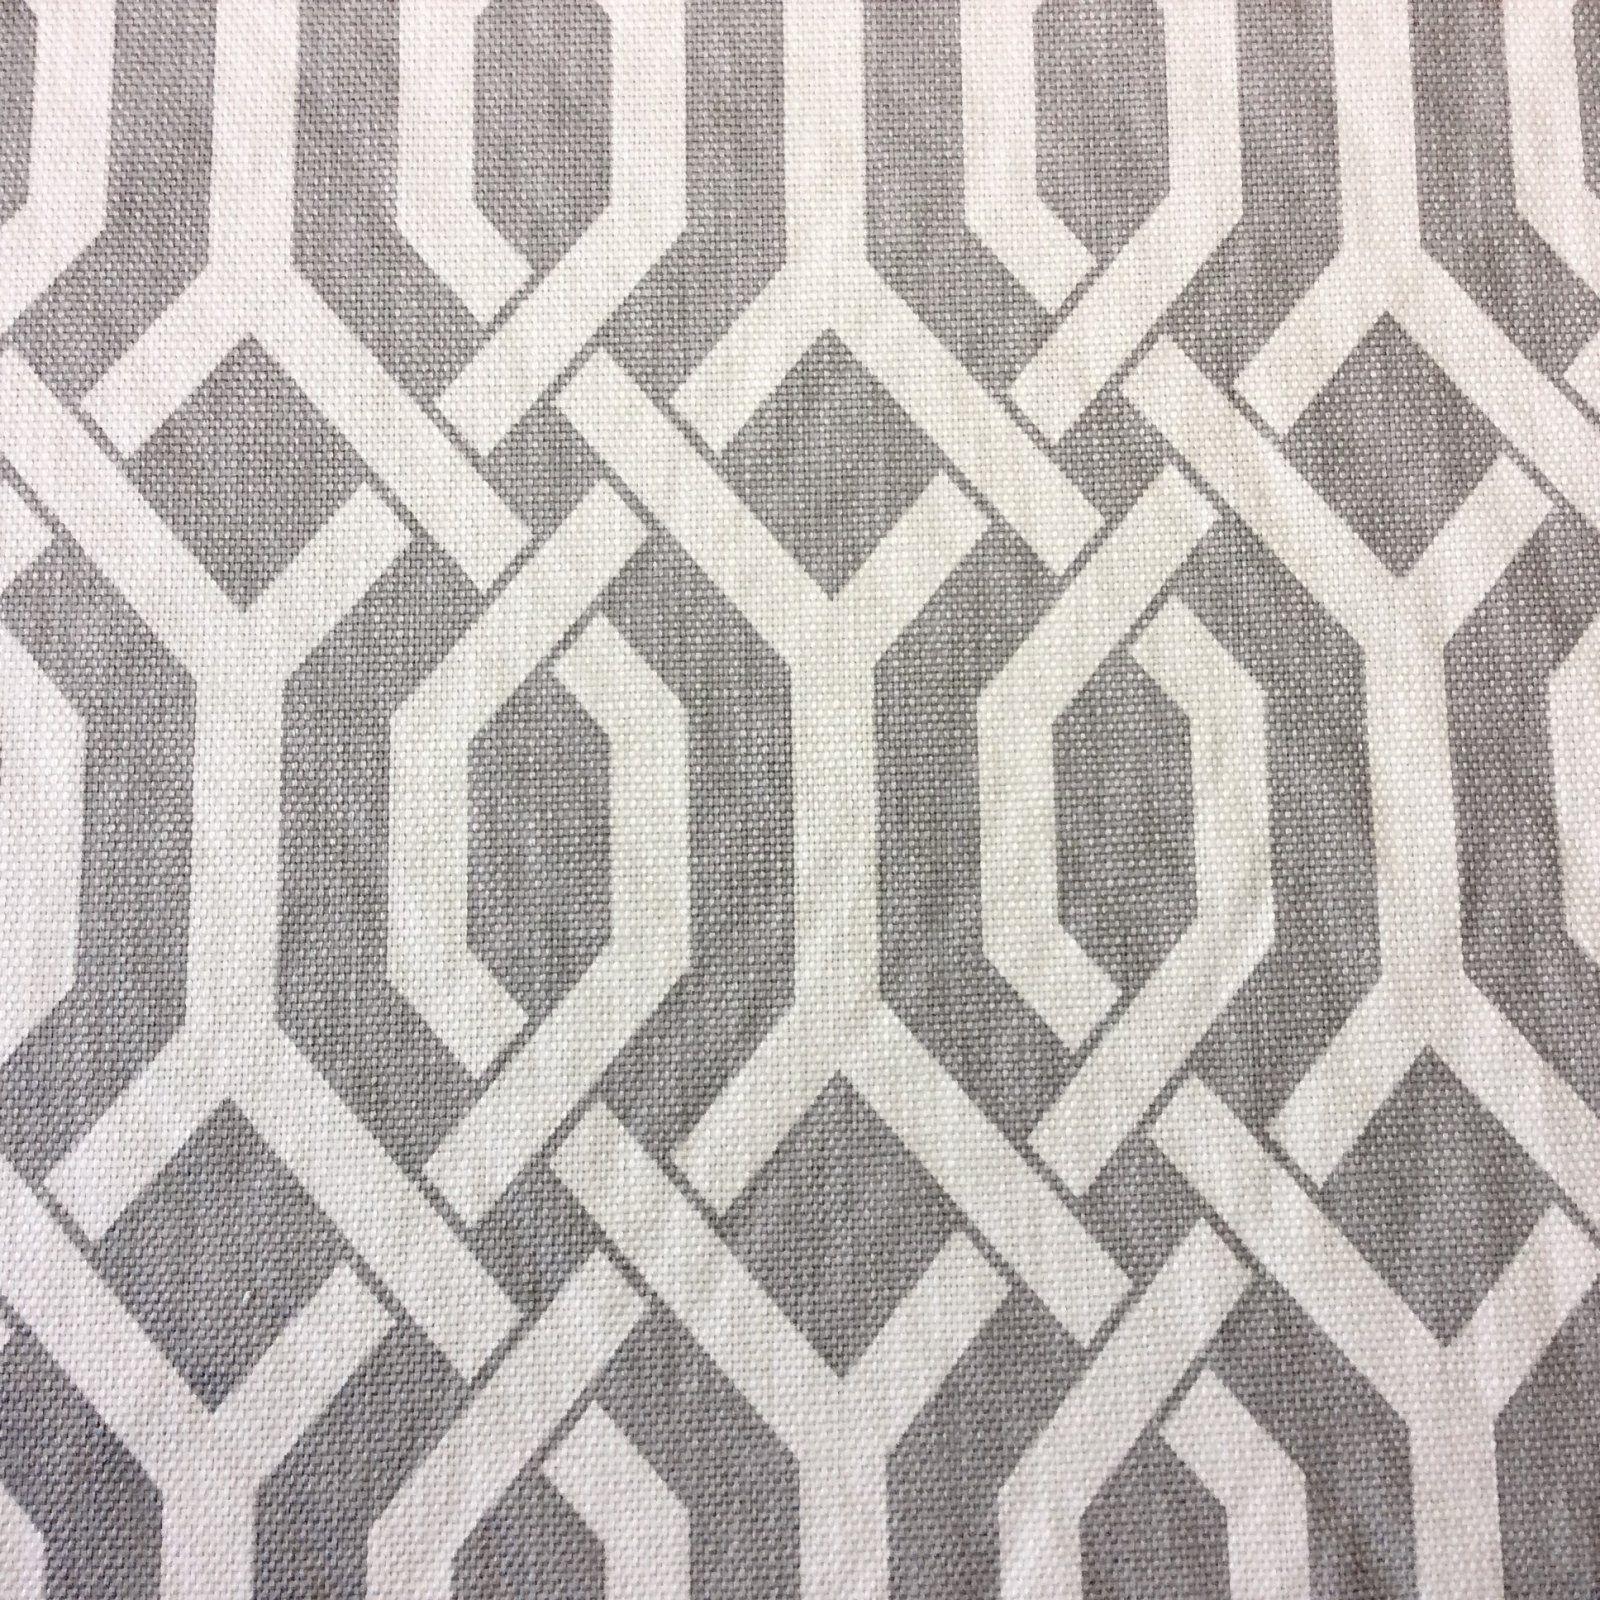 Nl243 Adler Style Scandinavian Mid Century Modern Contemporary Block Link Pr Modern Upholstery Fabric Mid Century Modern Upholstery Fabric Modern Fabric Prints